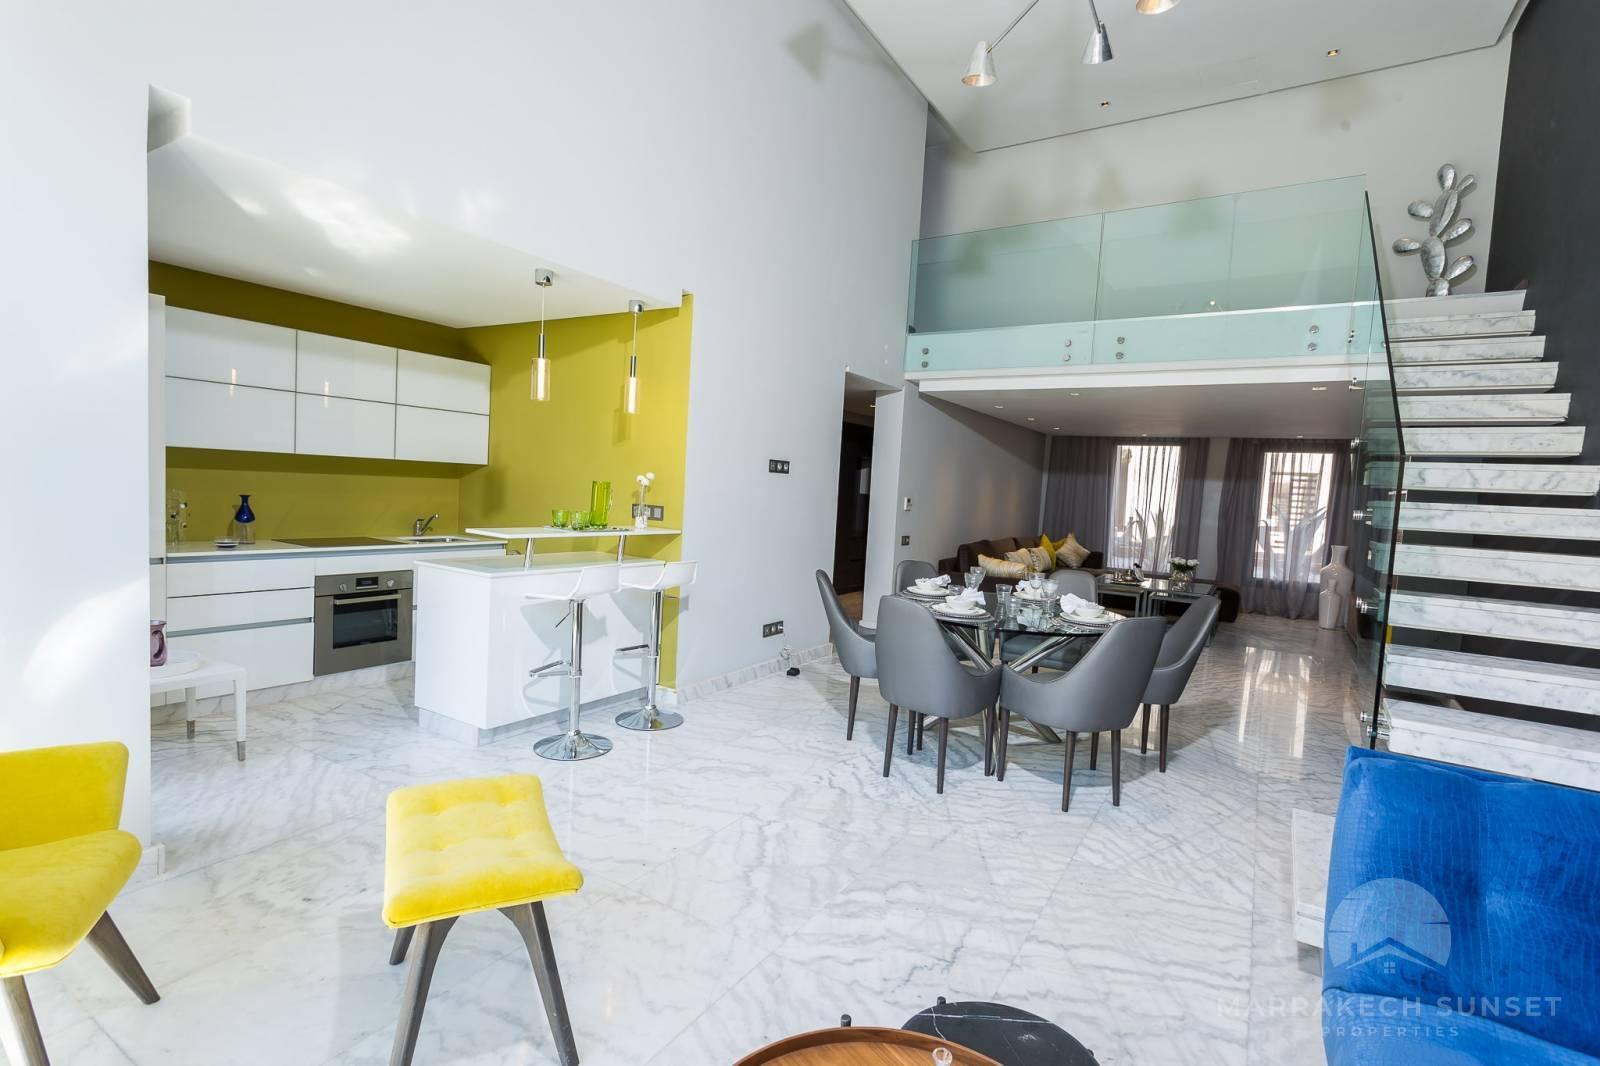 Luxury 2 bedroom Loft apartment for sale in Marrakech